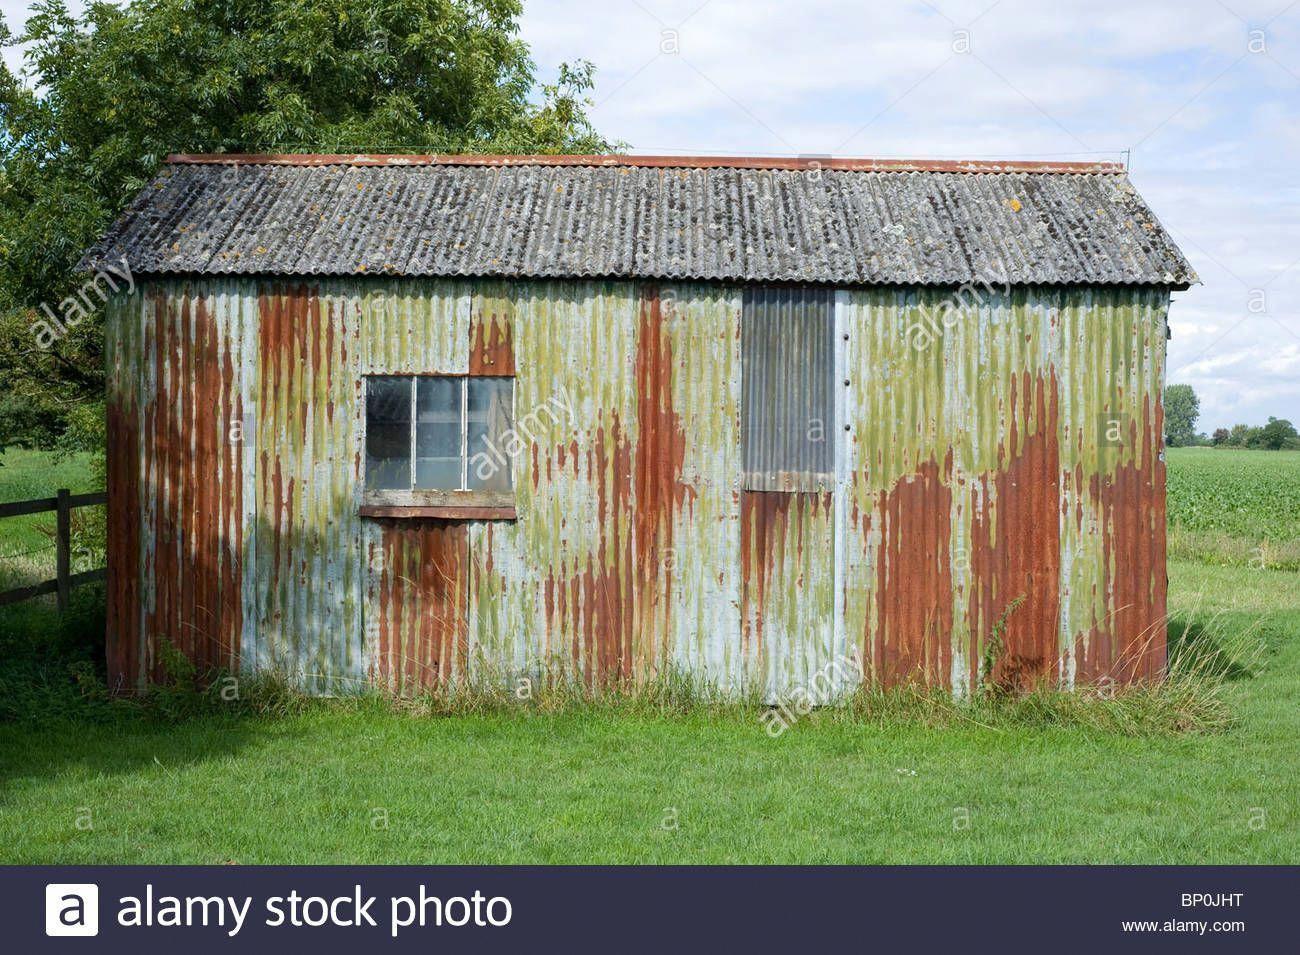 Metal shed kits lowes 10x10 shed plans pdf corrugated iron sheds uk howtobuildagardenshed